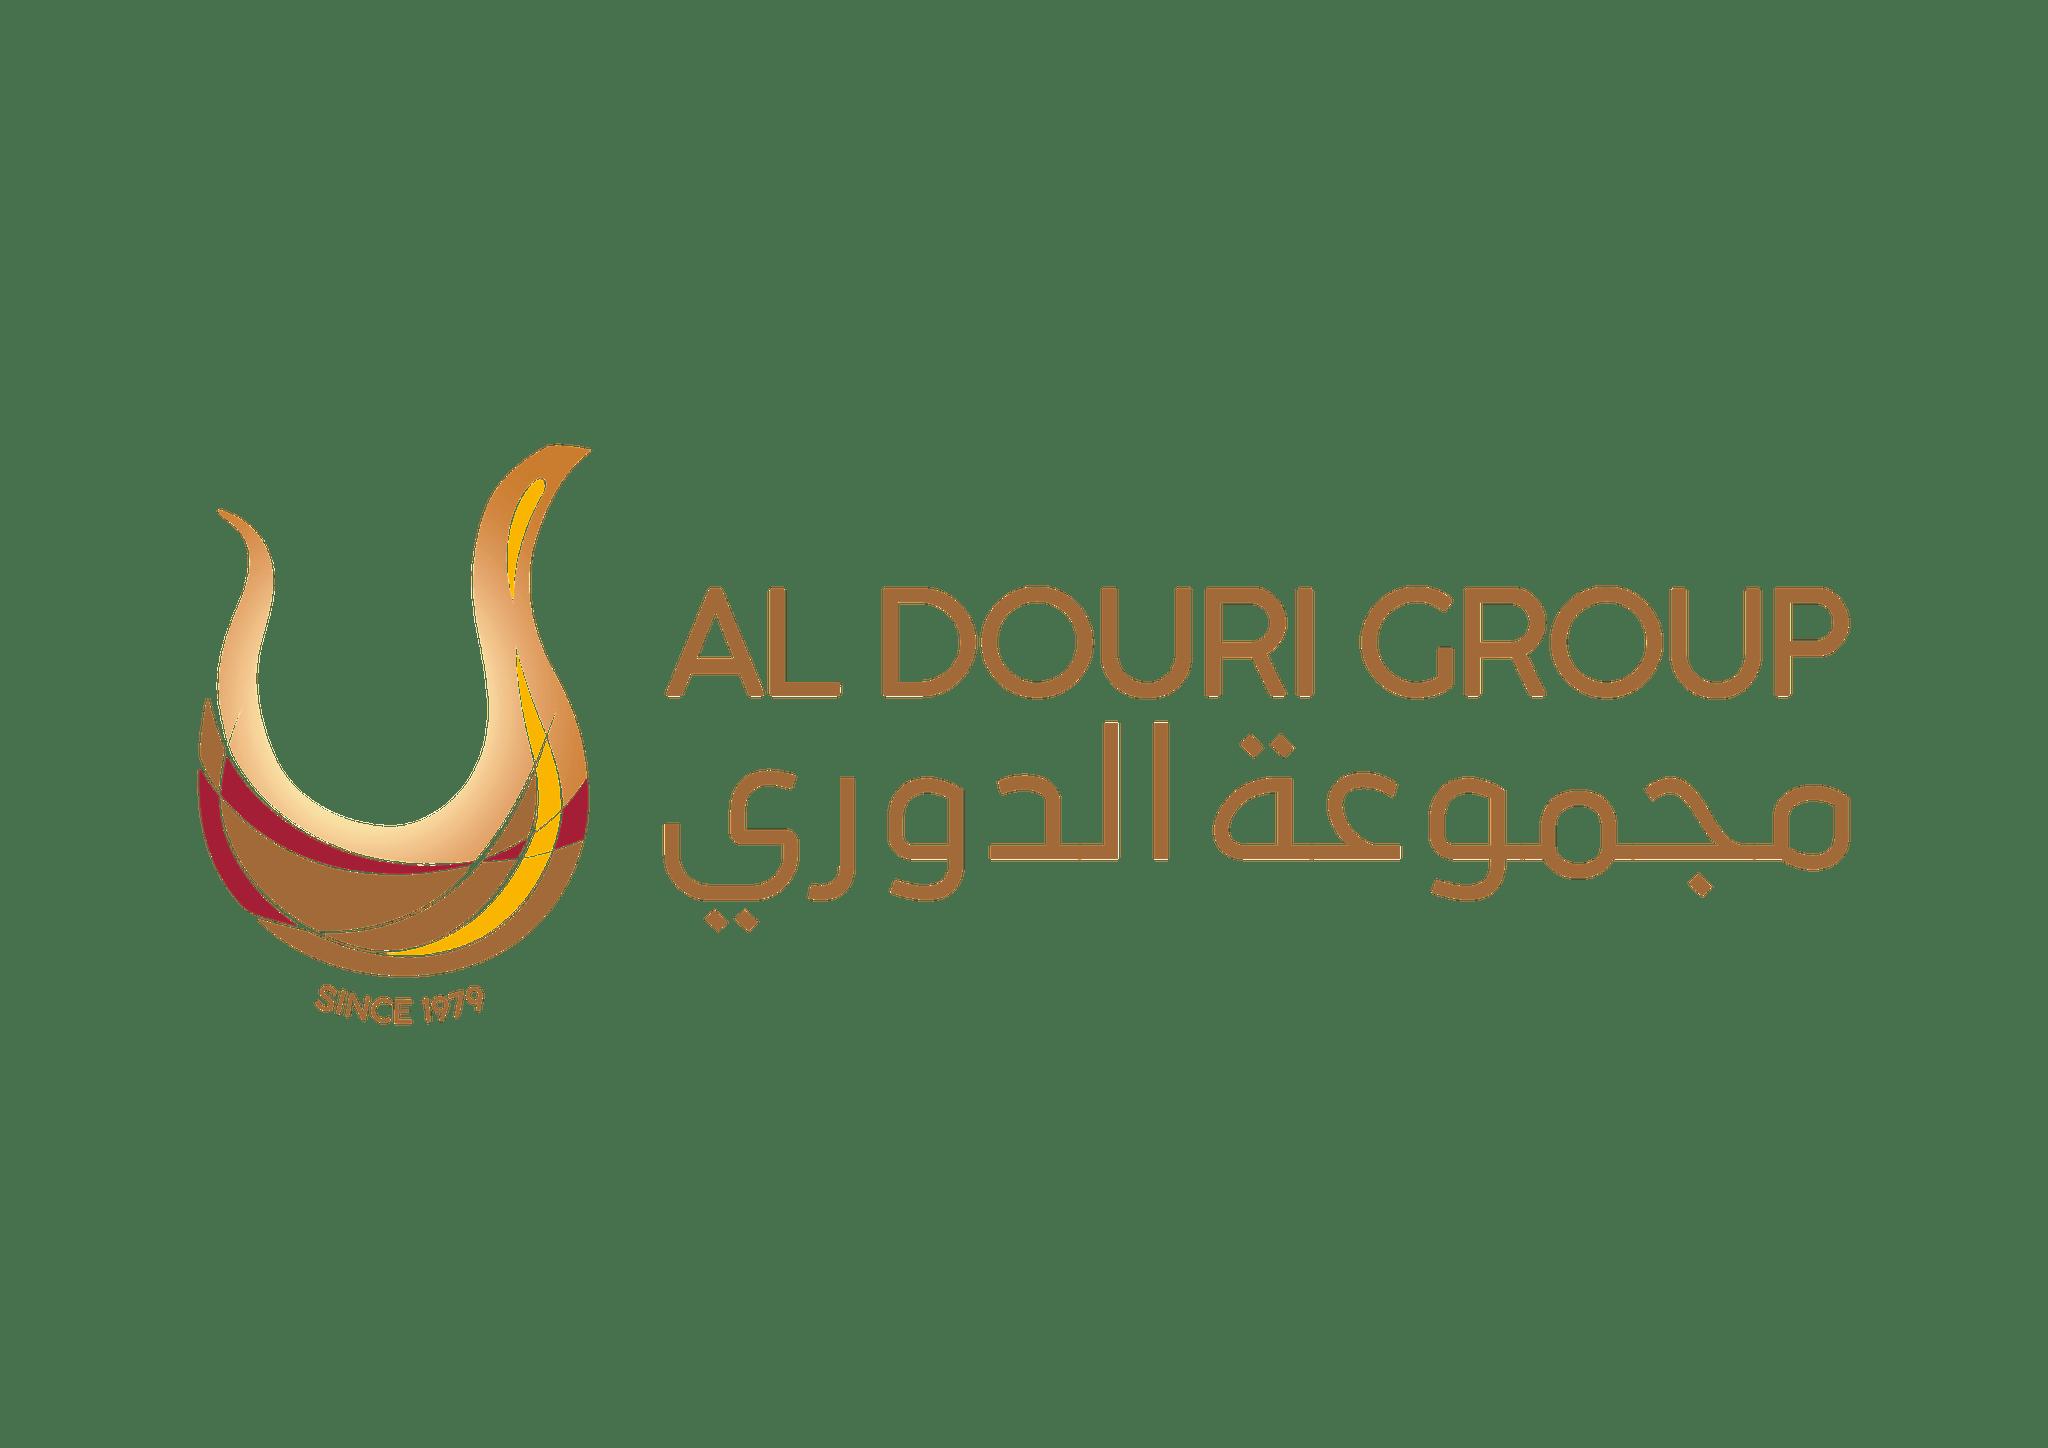 Al Douri Food Industries Co  LLC  - Gulfood 2019 - World's largest